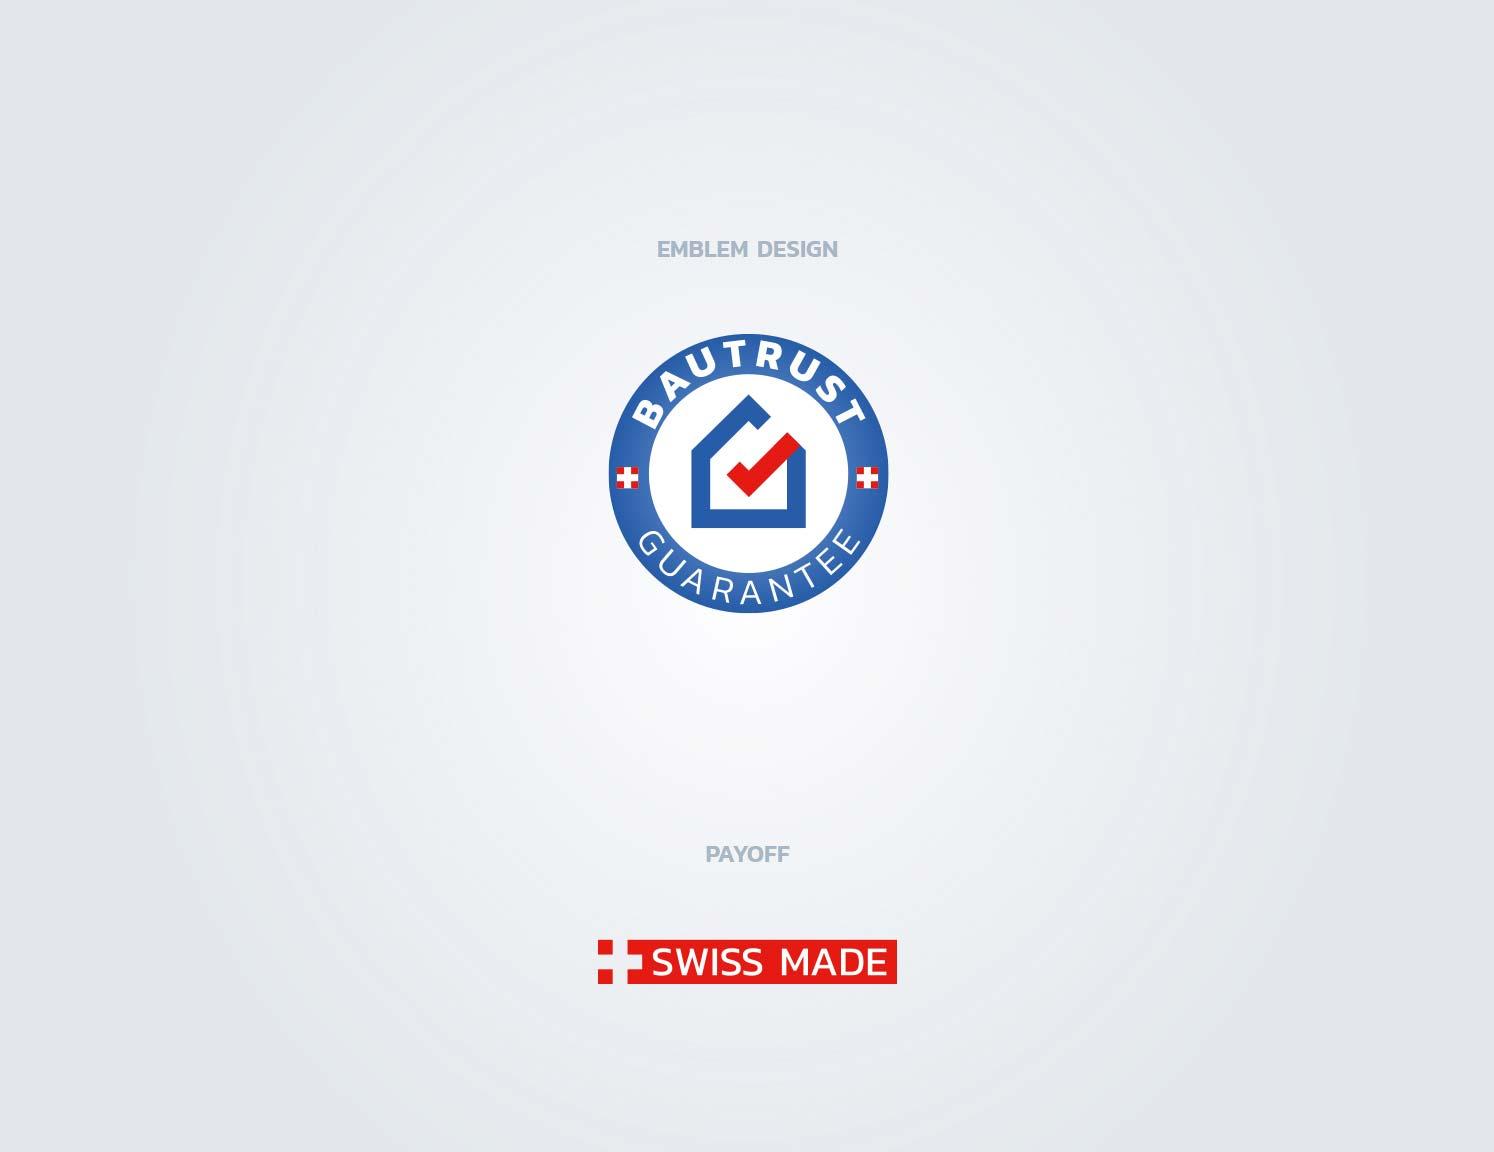 immagine coordinata logo emblema sigillo di qualità